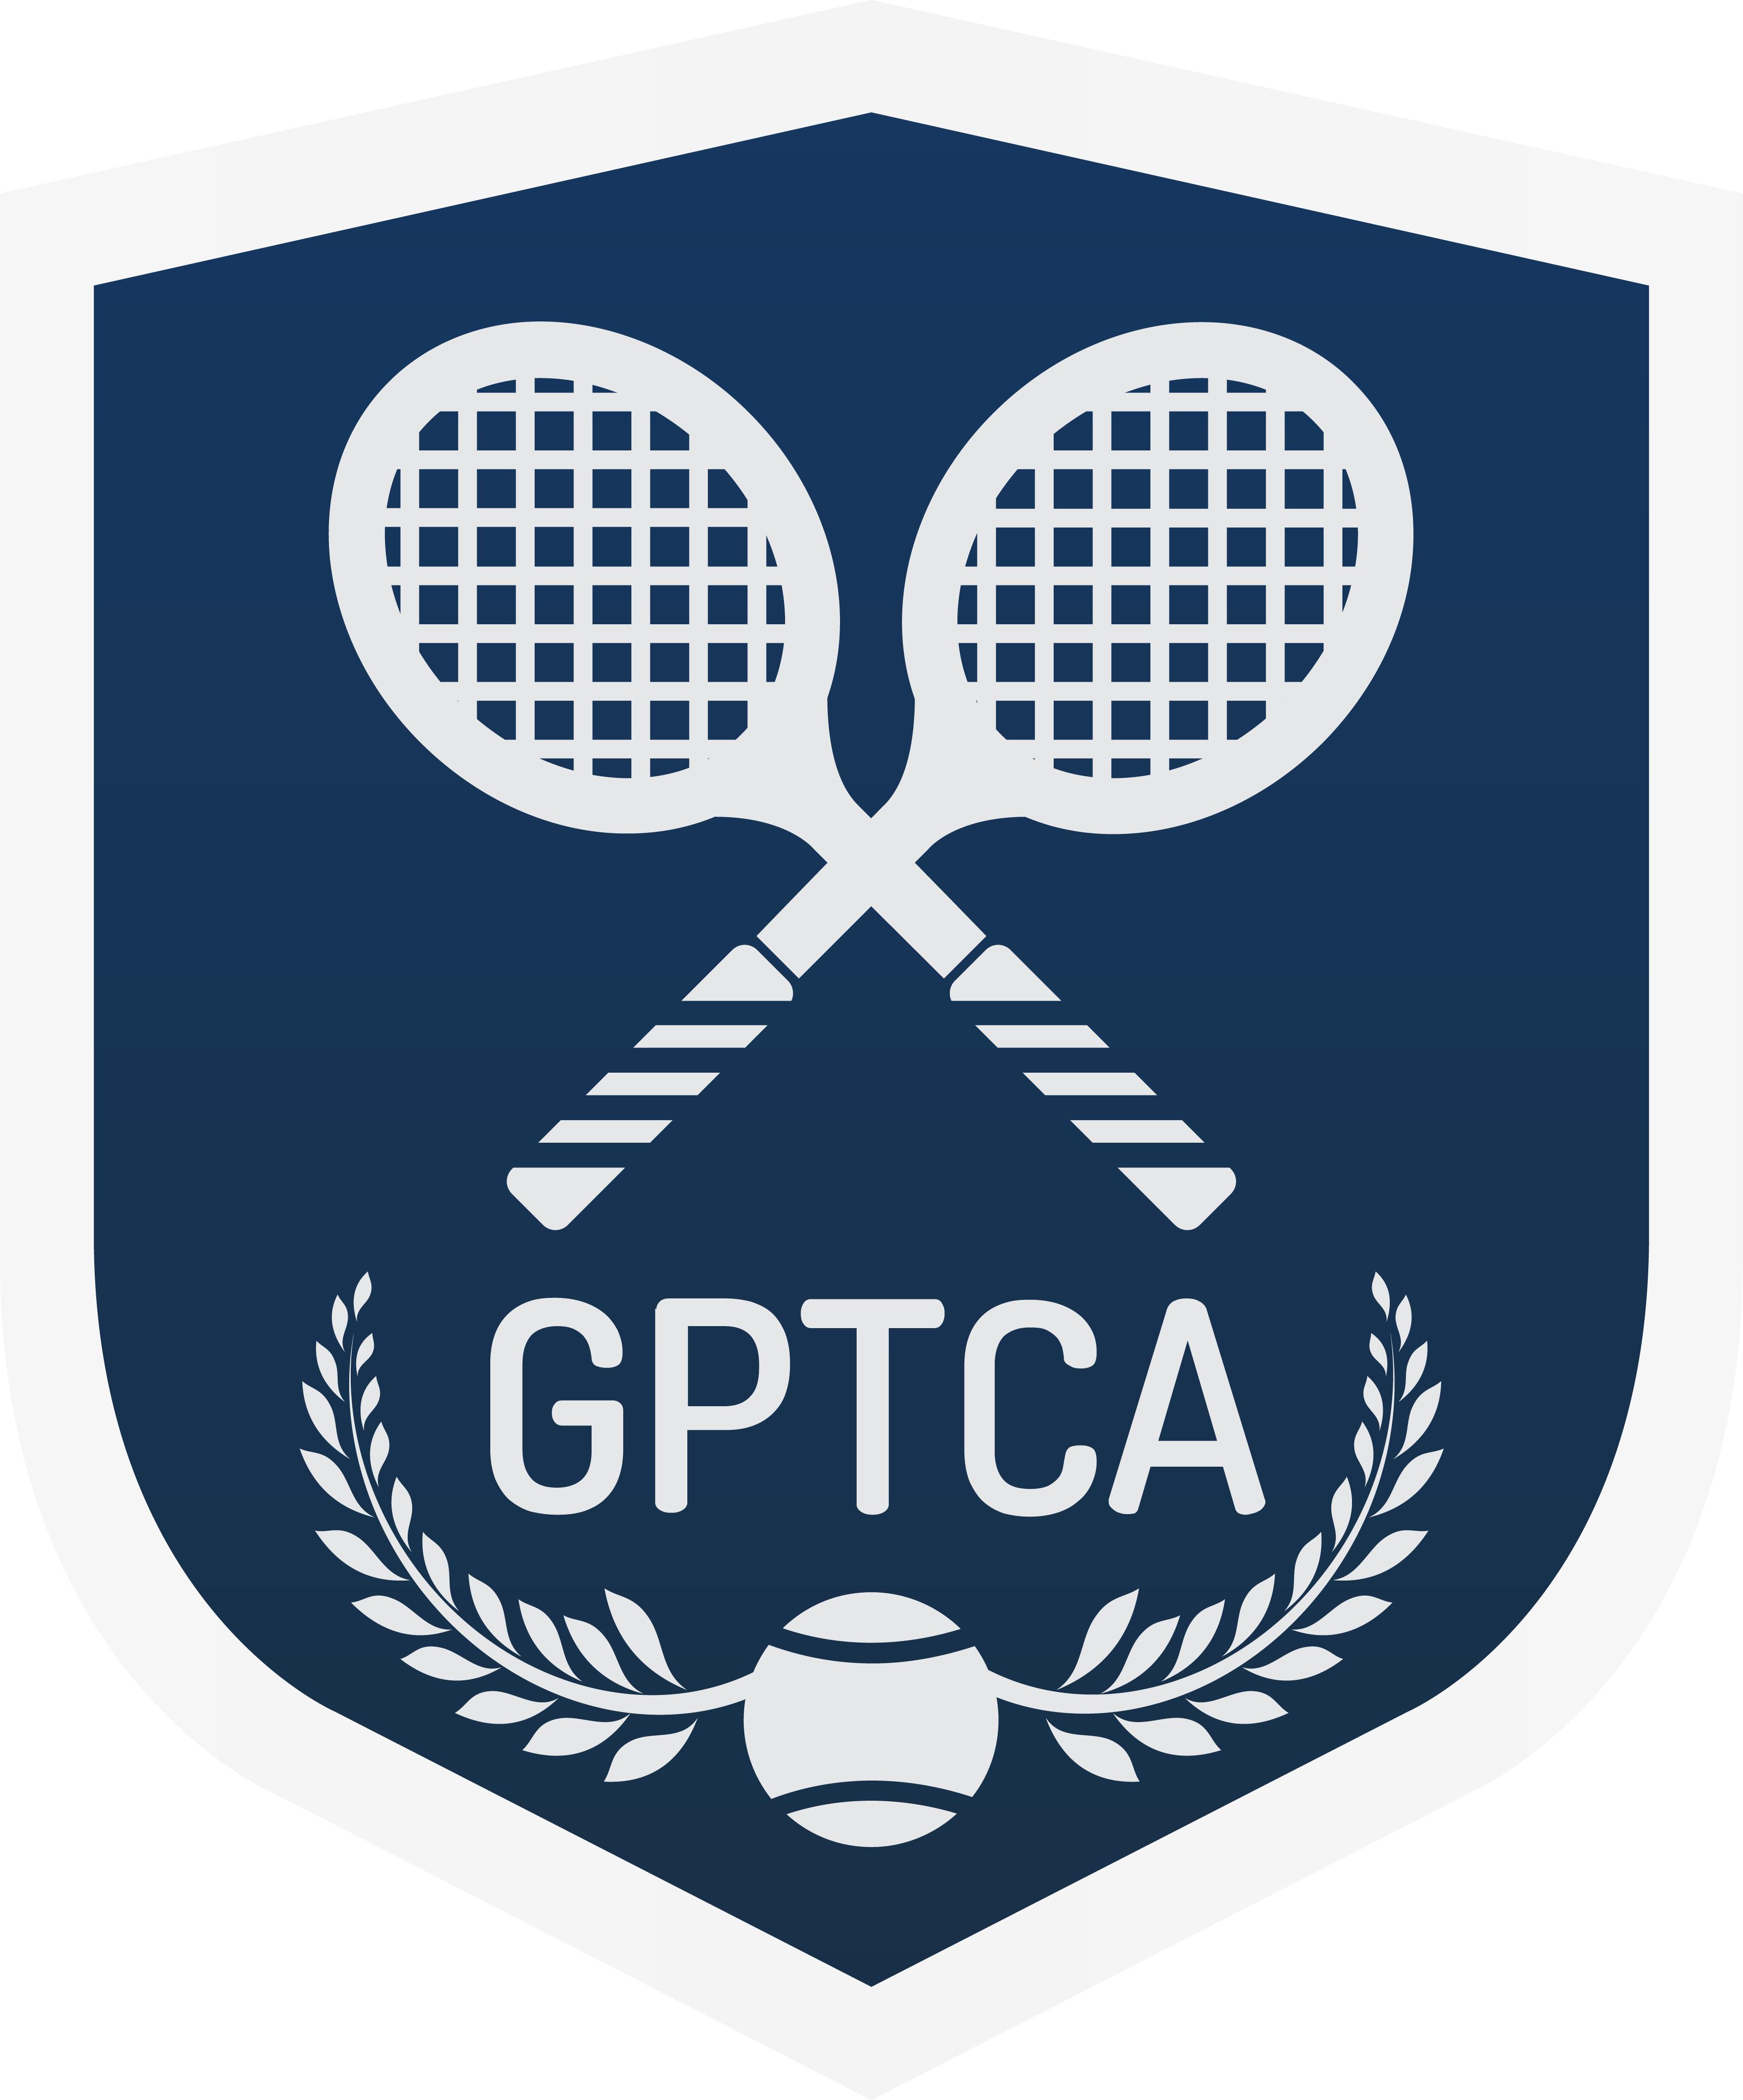 GPTCA